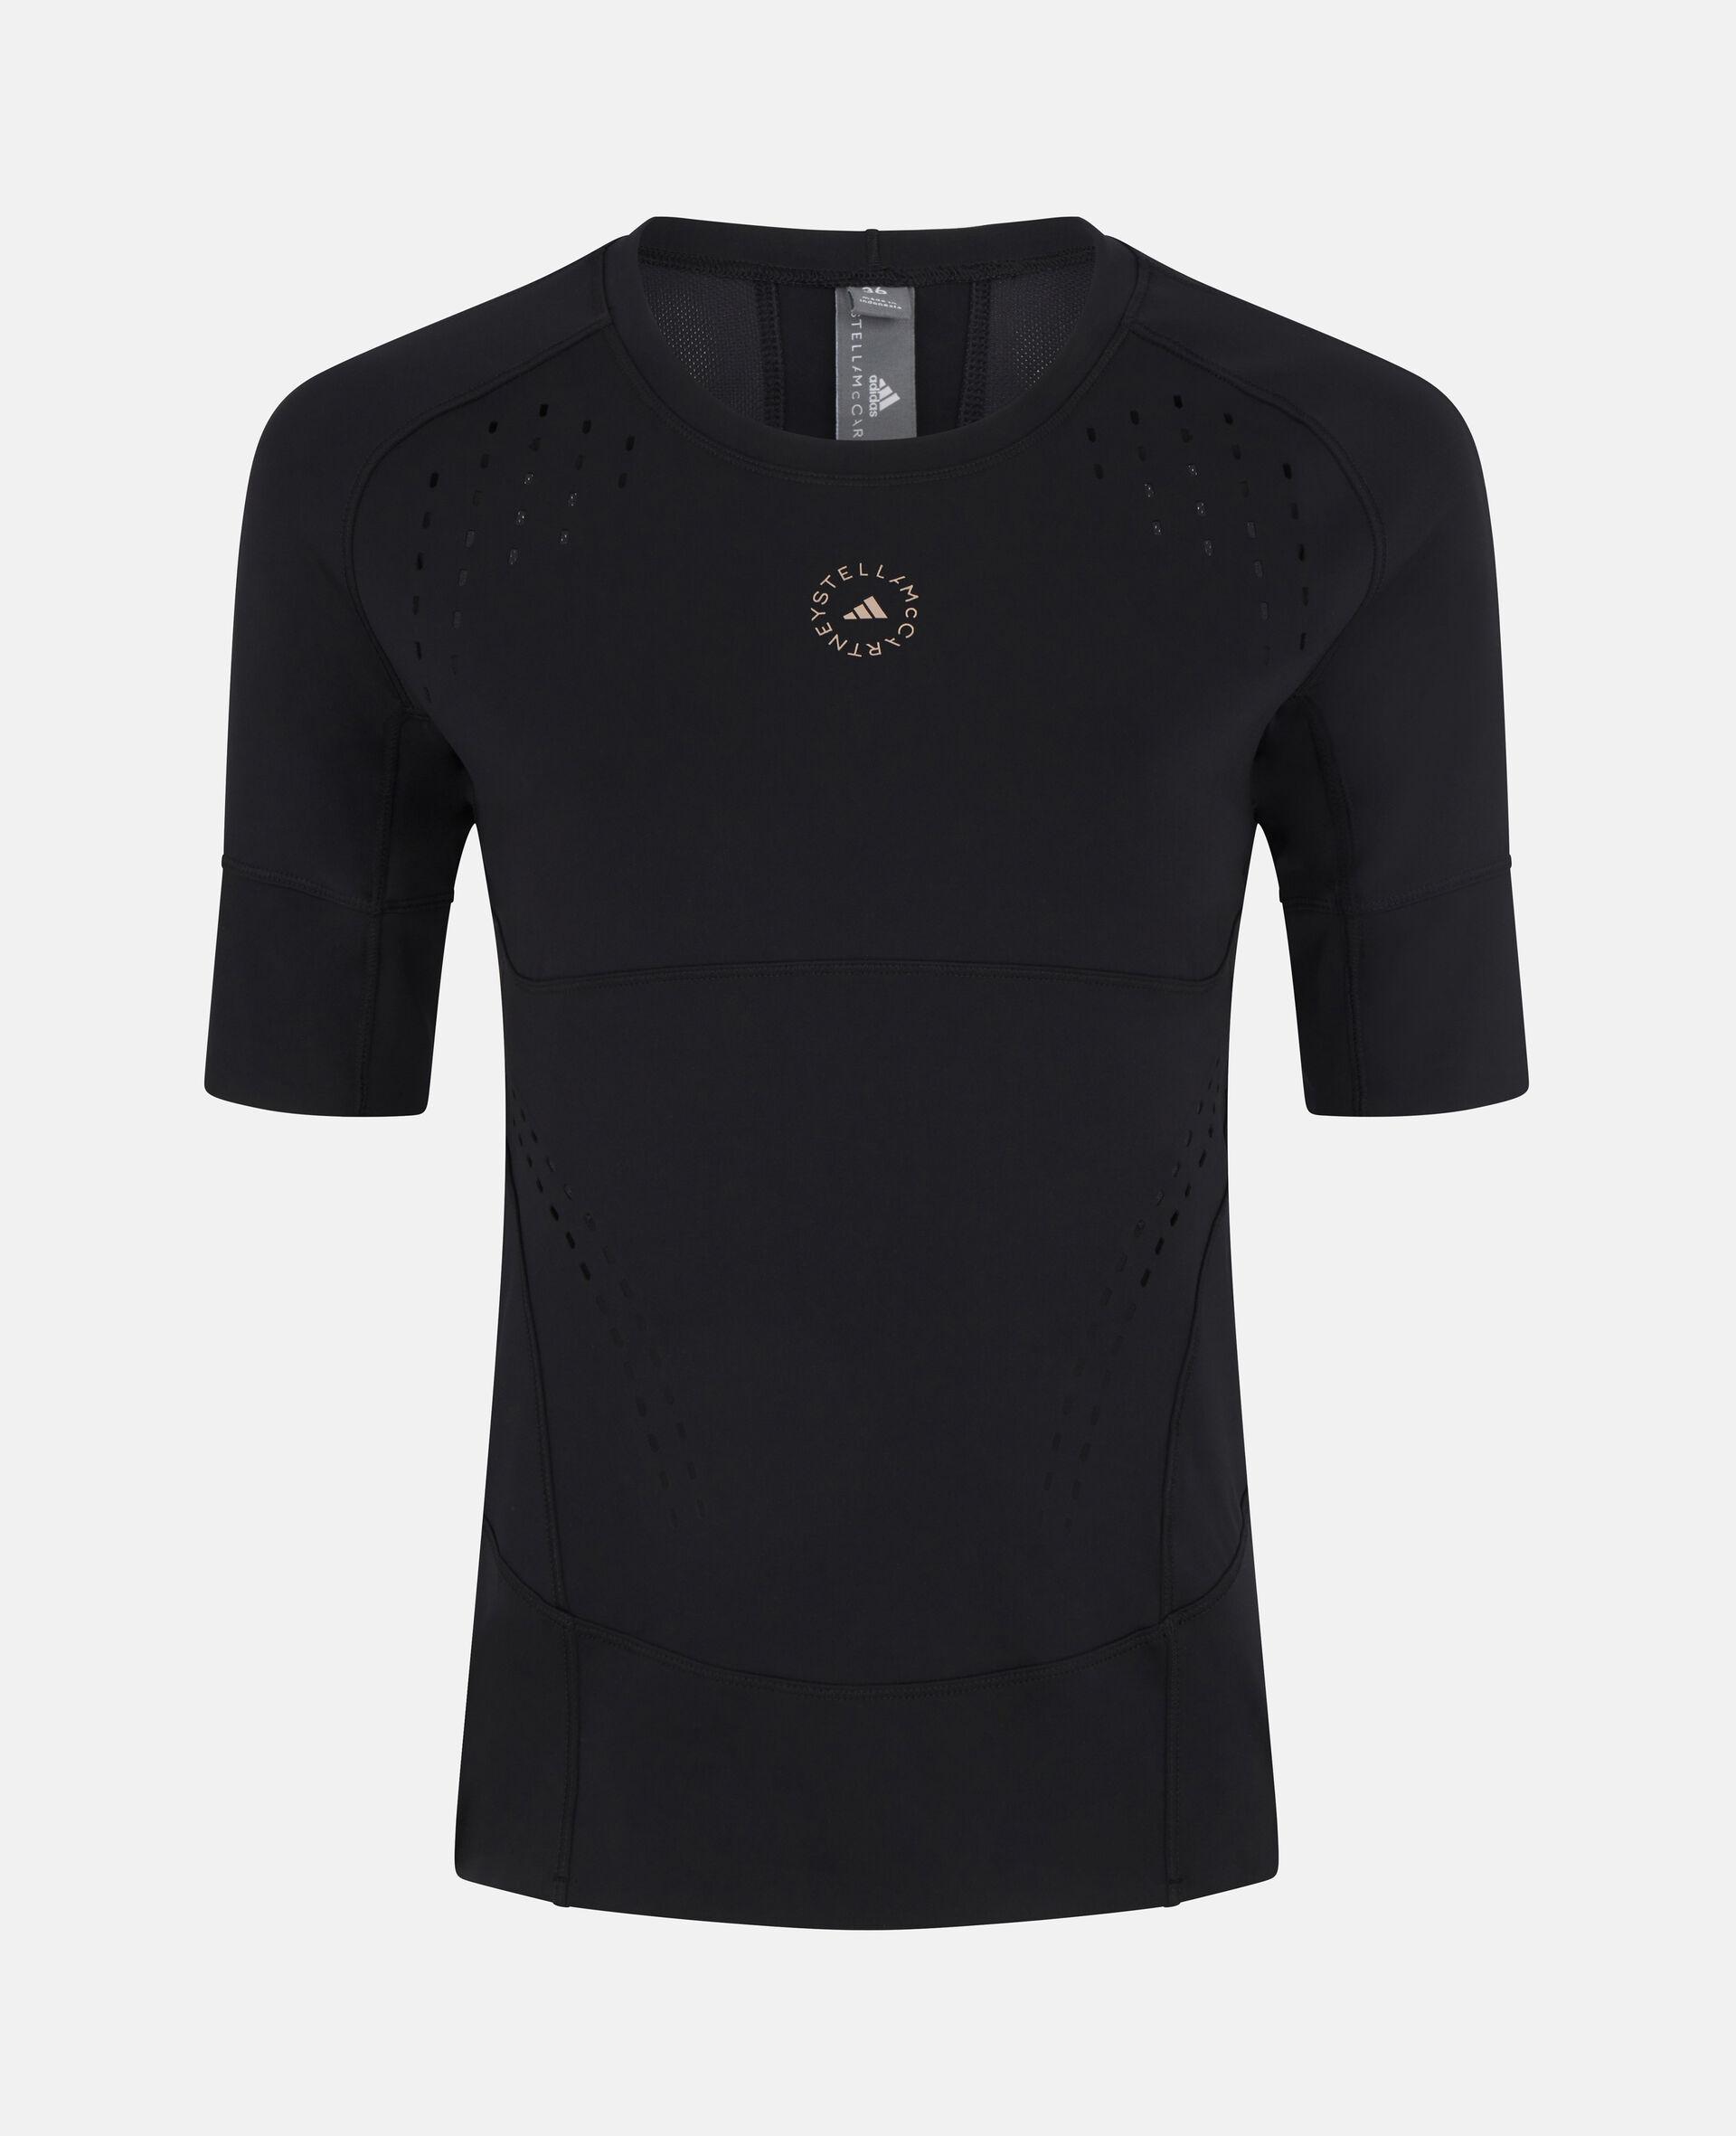 Black TruePurpose Training T-Shirt-Black-large image number 0